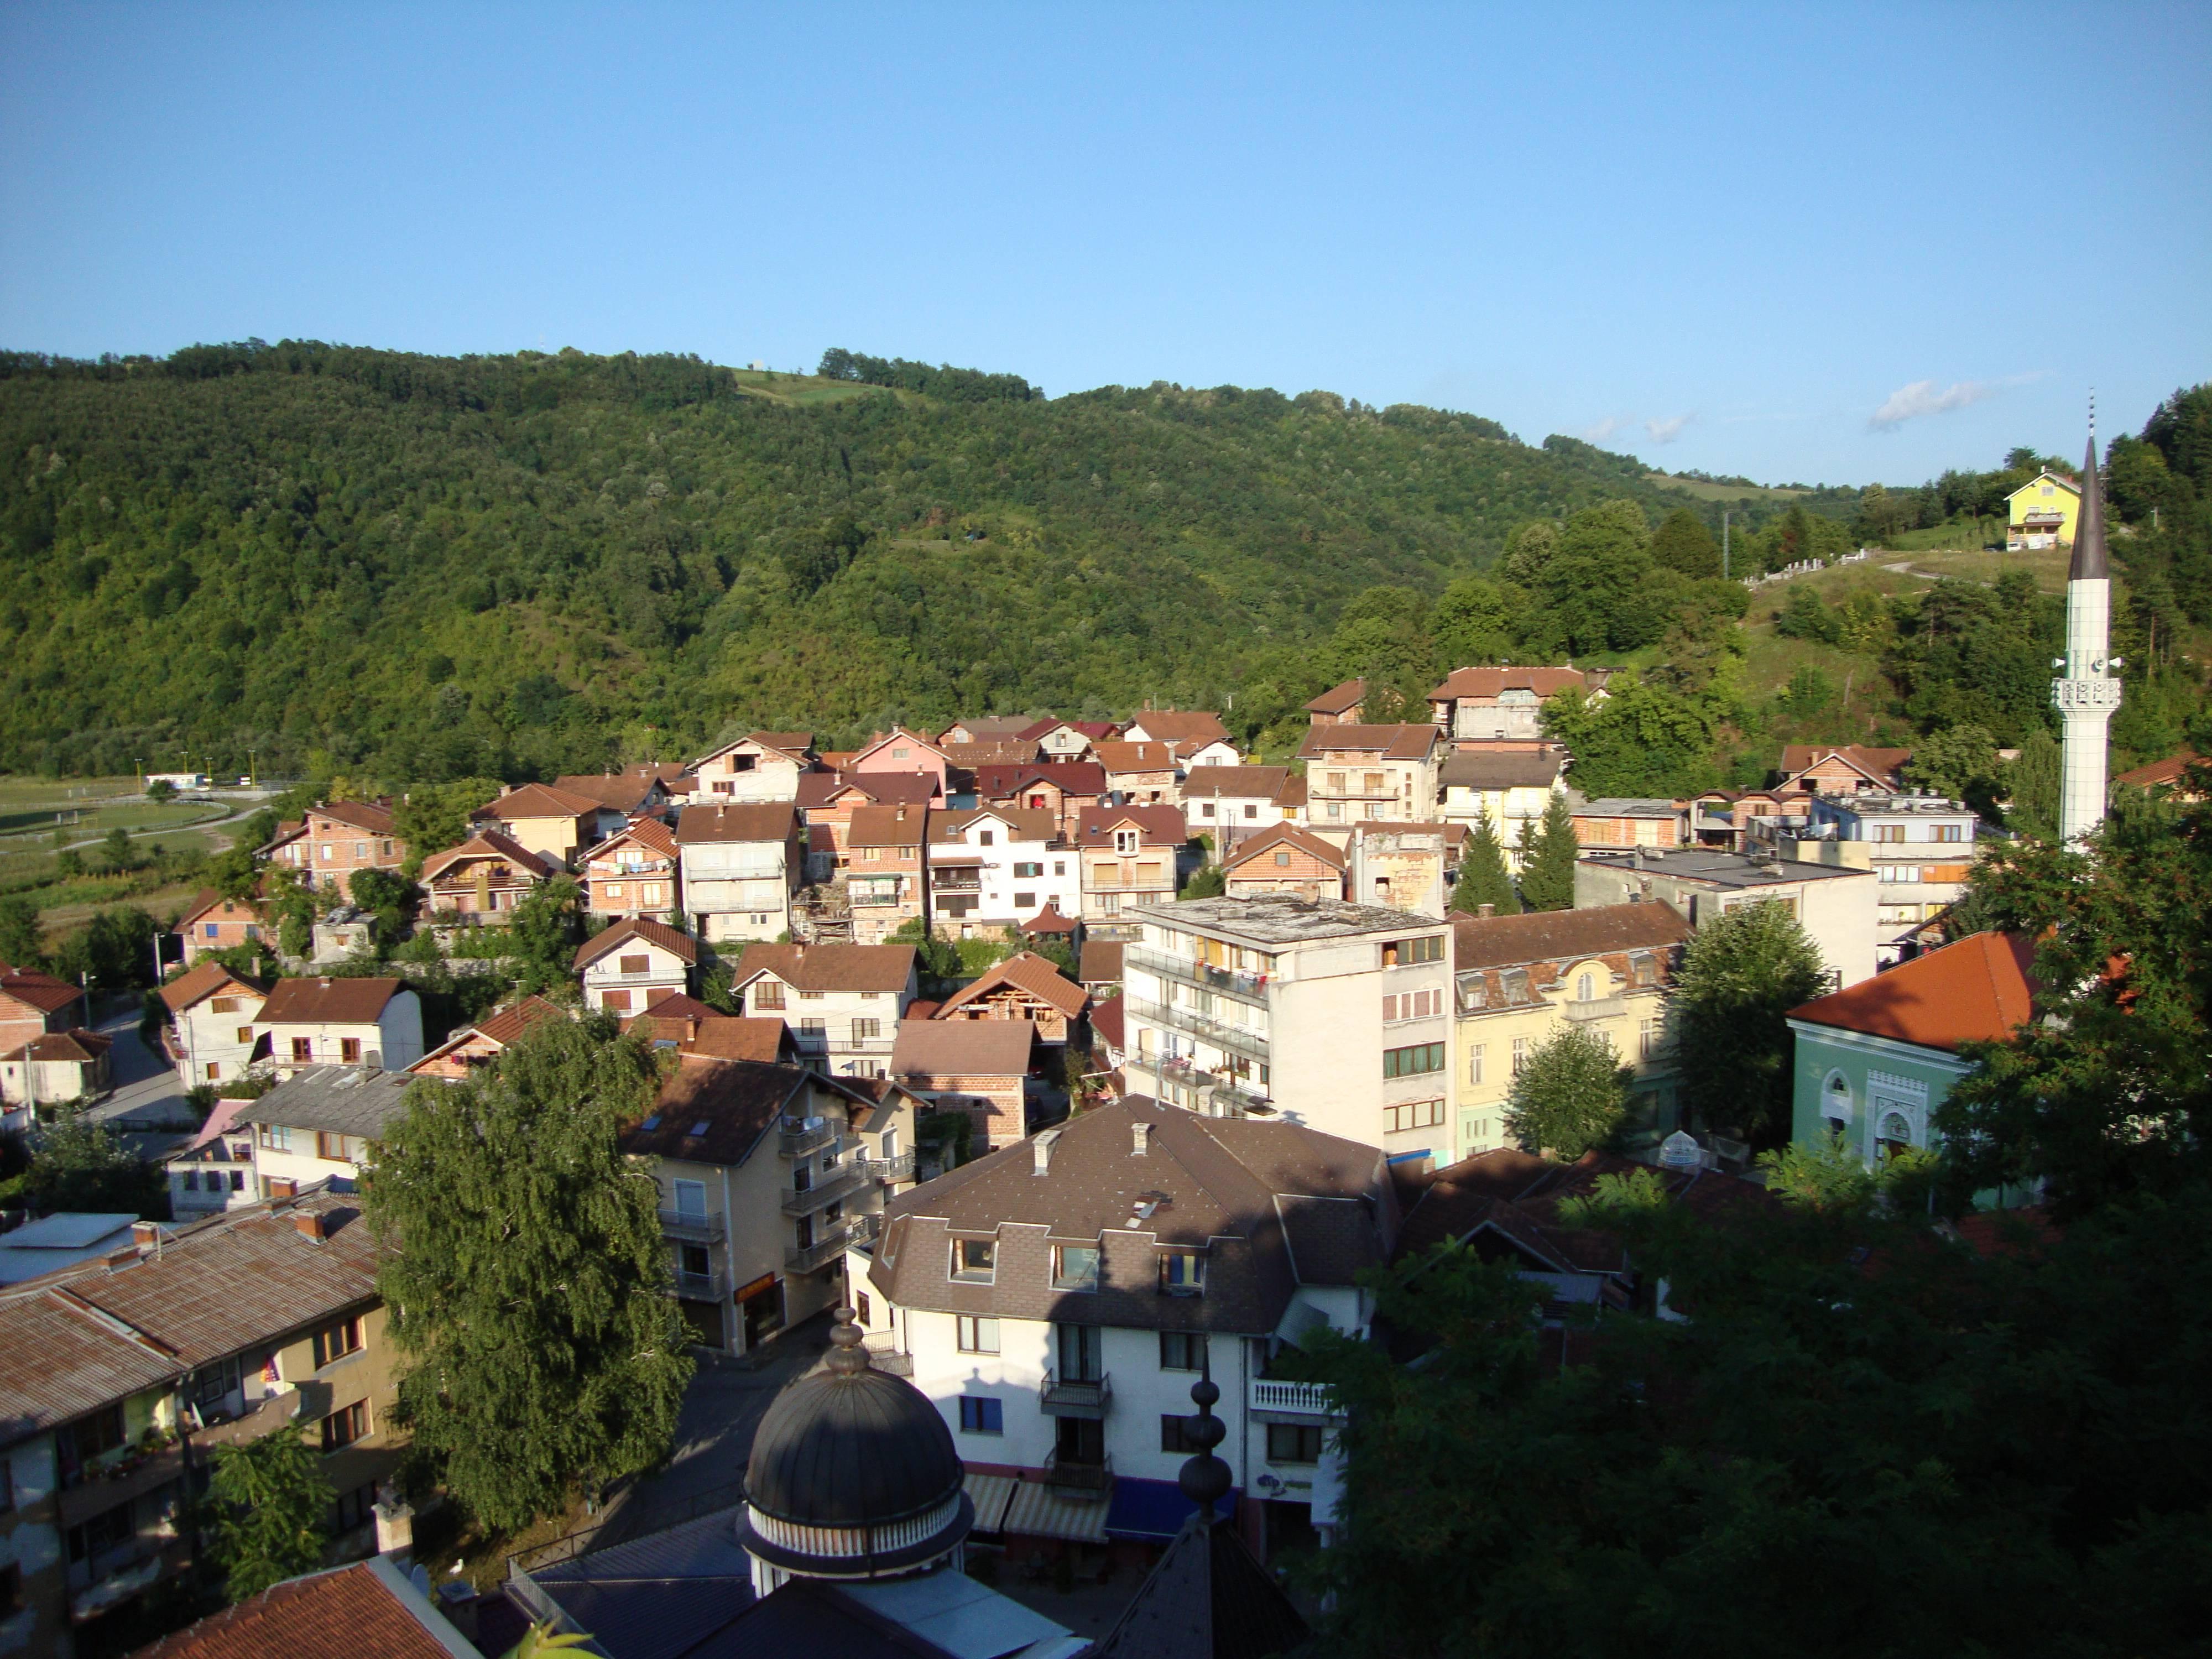 Photo 1: La Bosnie Herzégovine